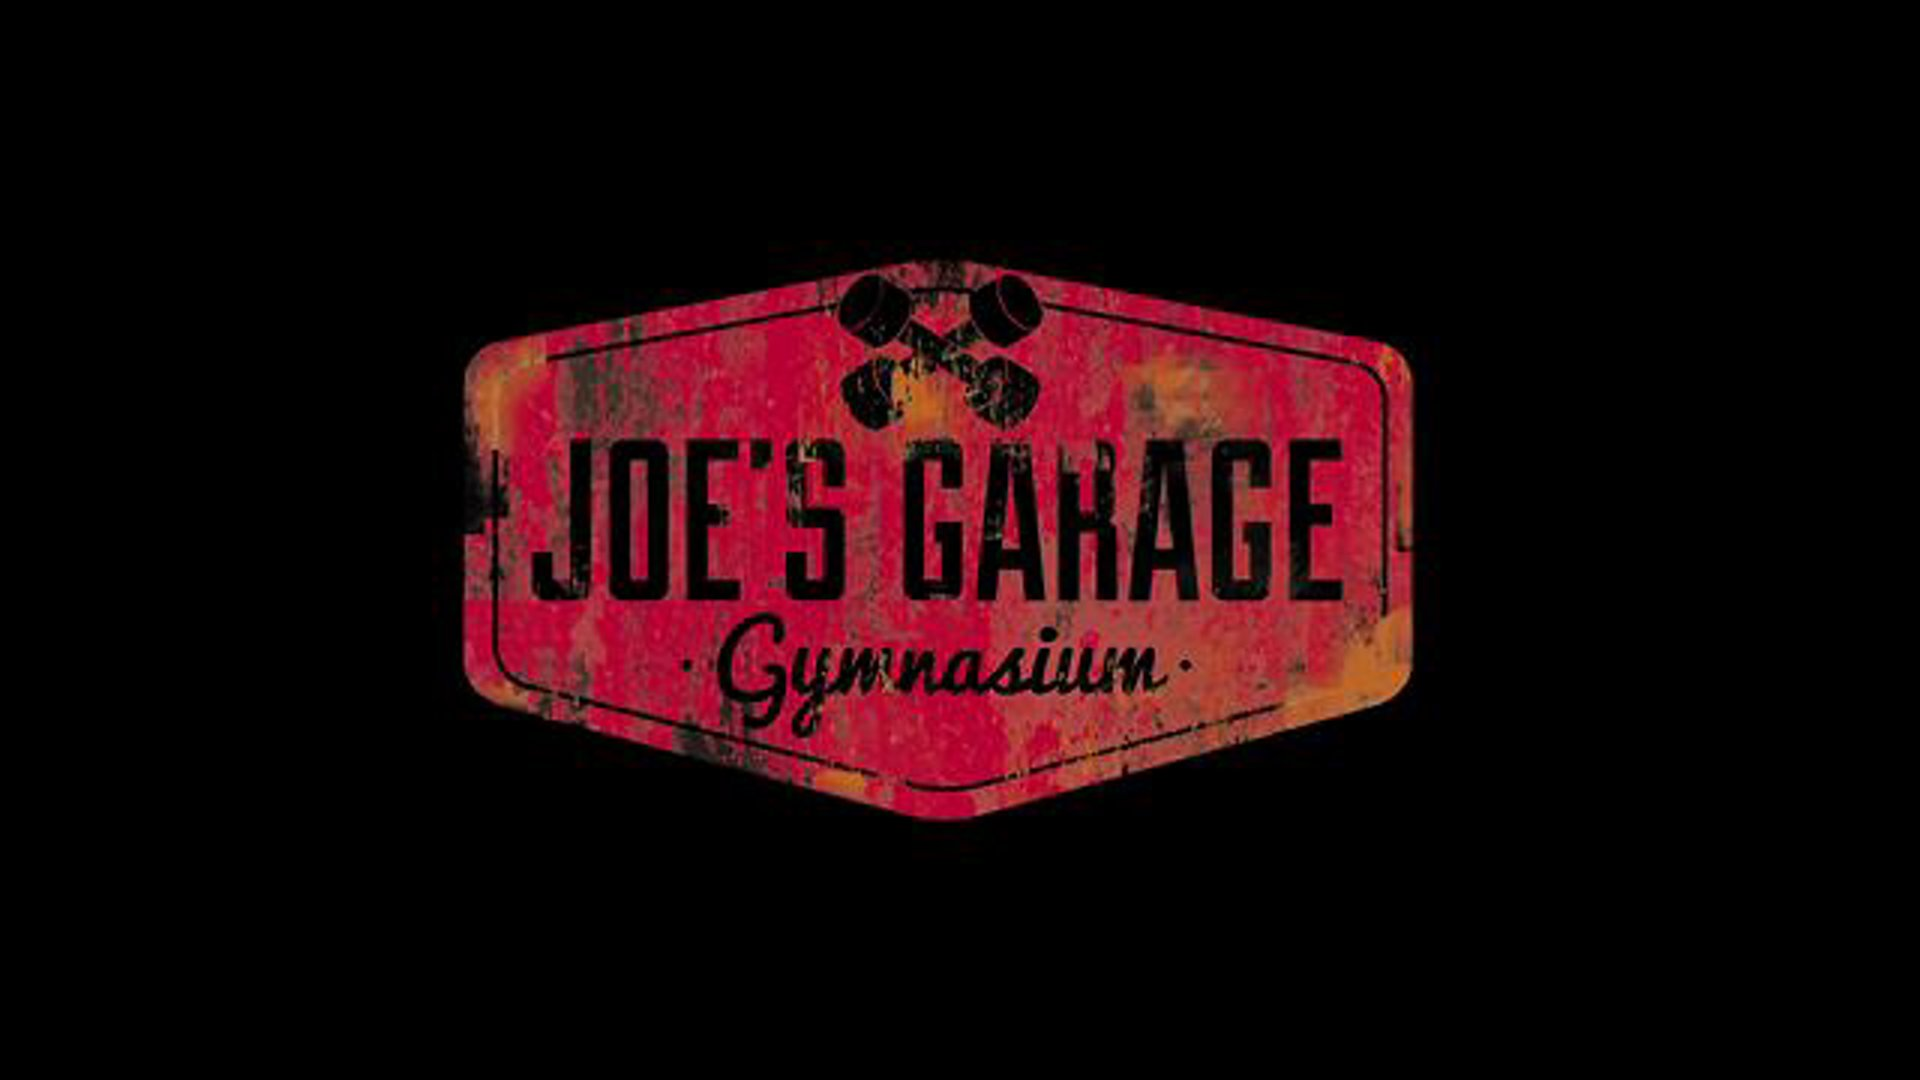 Joe s garage nothinbutshorts international